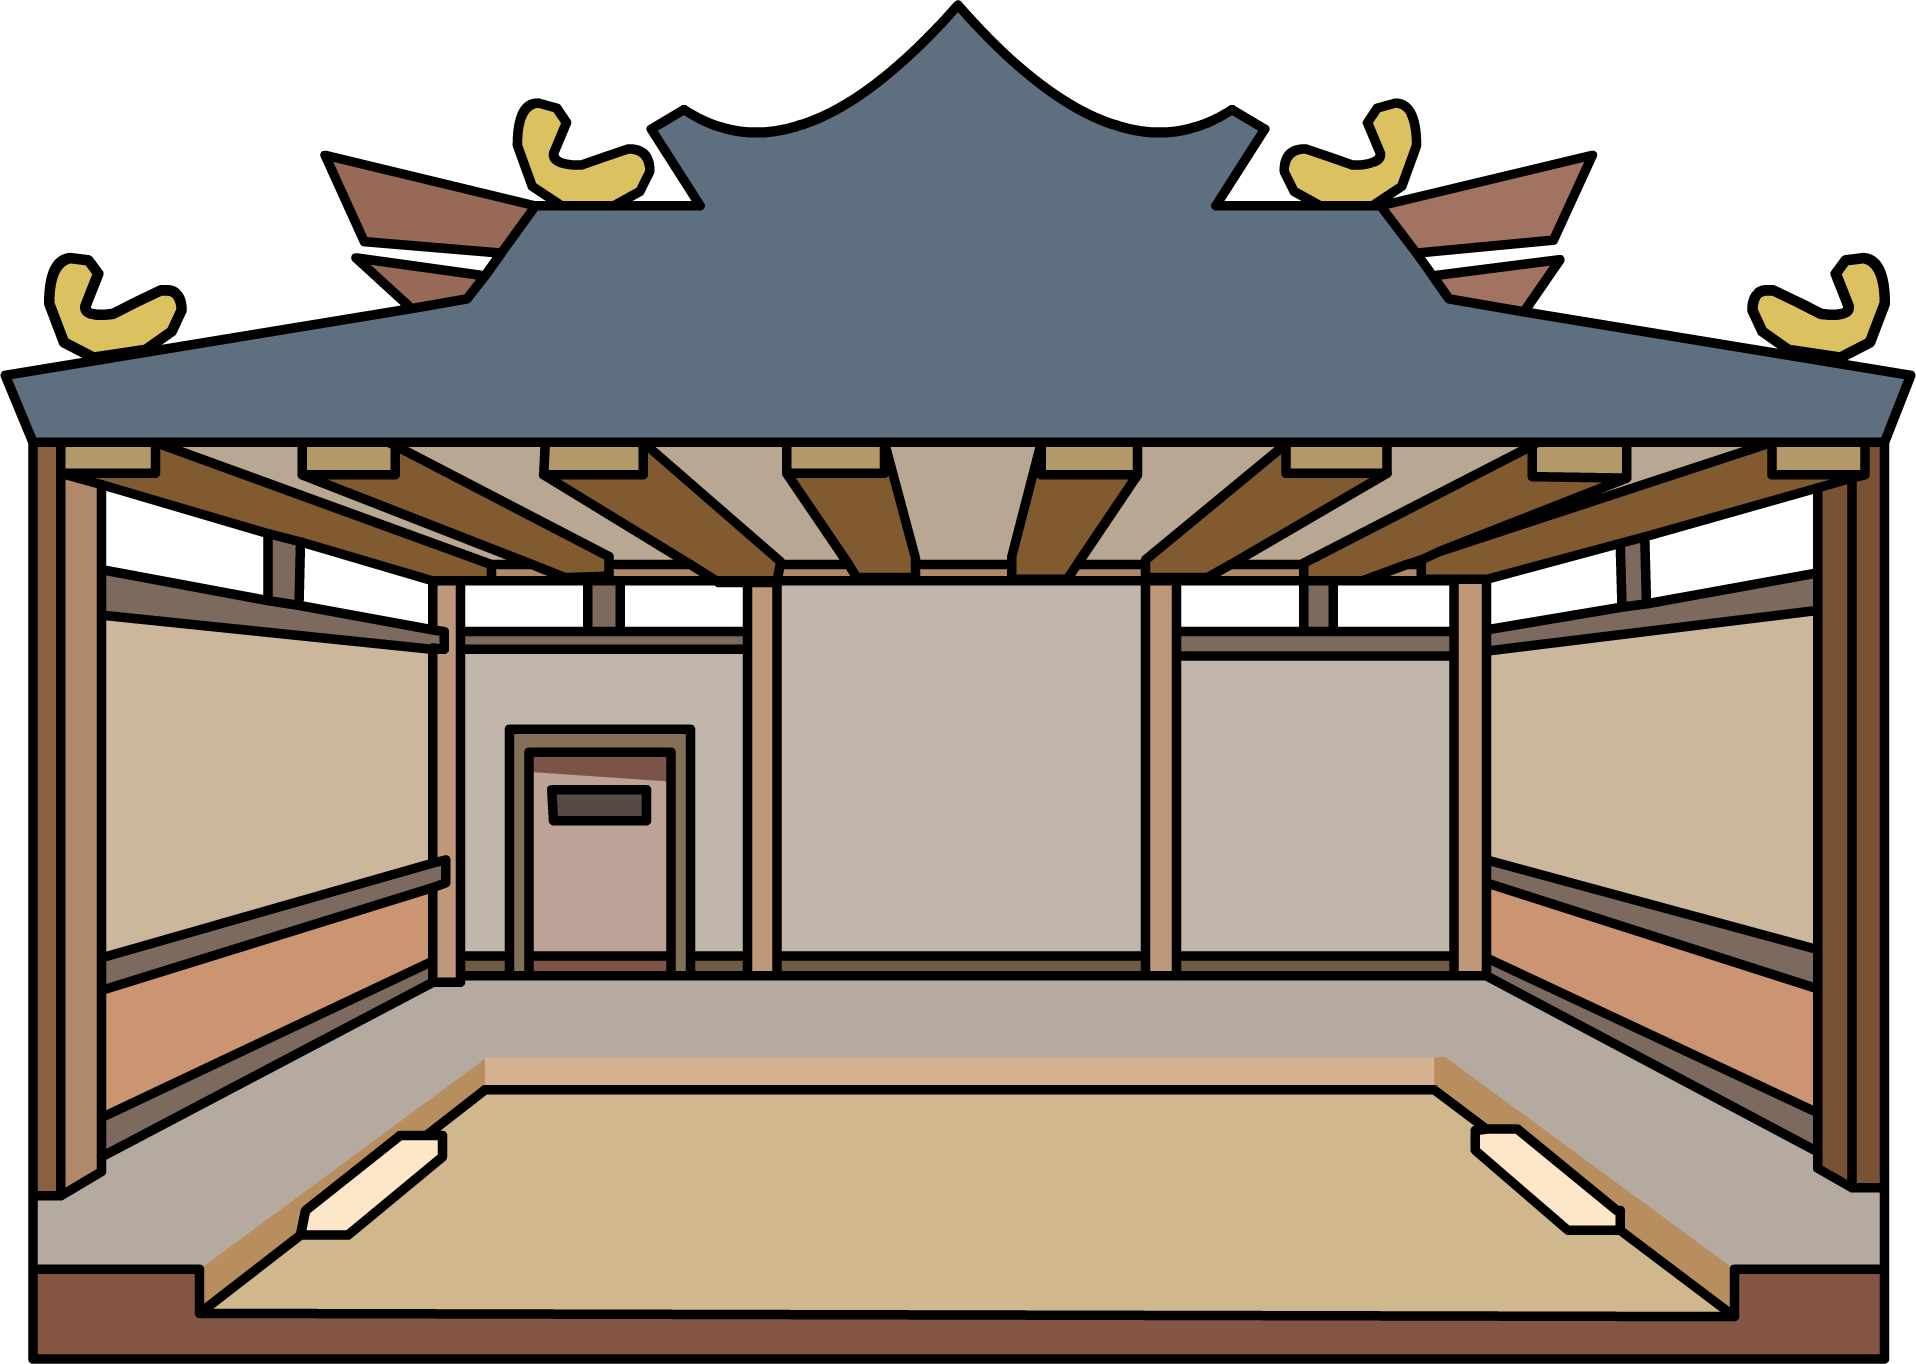 Image dojo igloo icon. Gingerbread clipart ninja